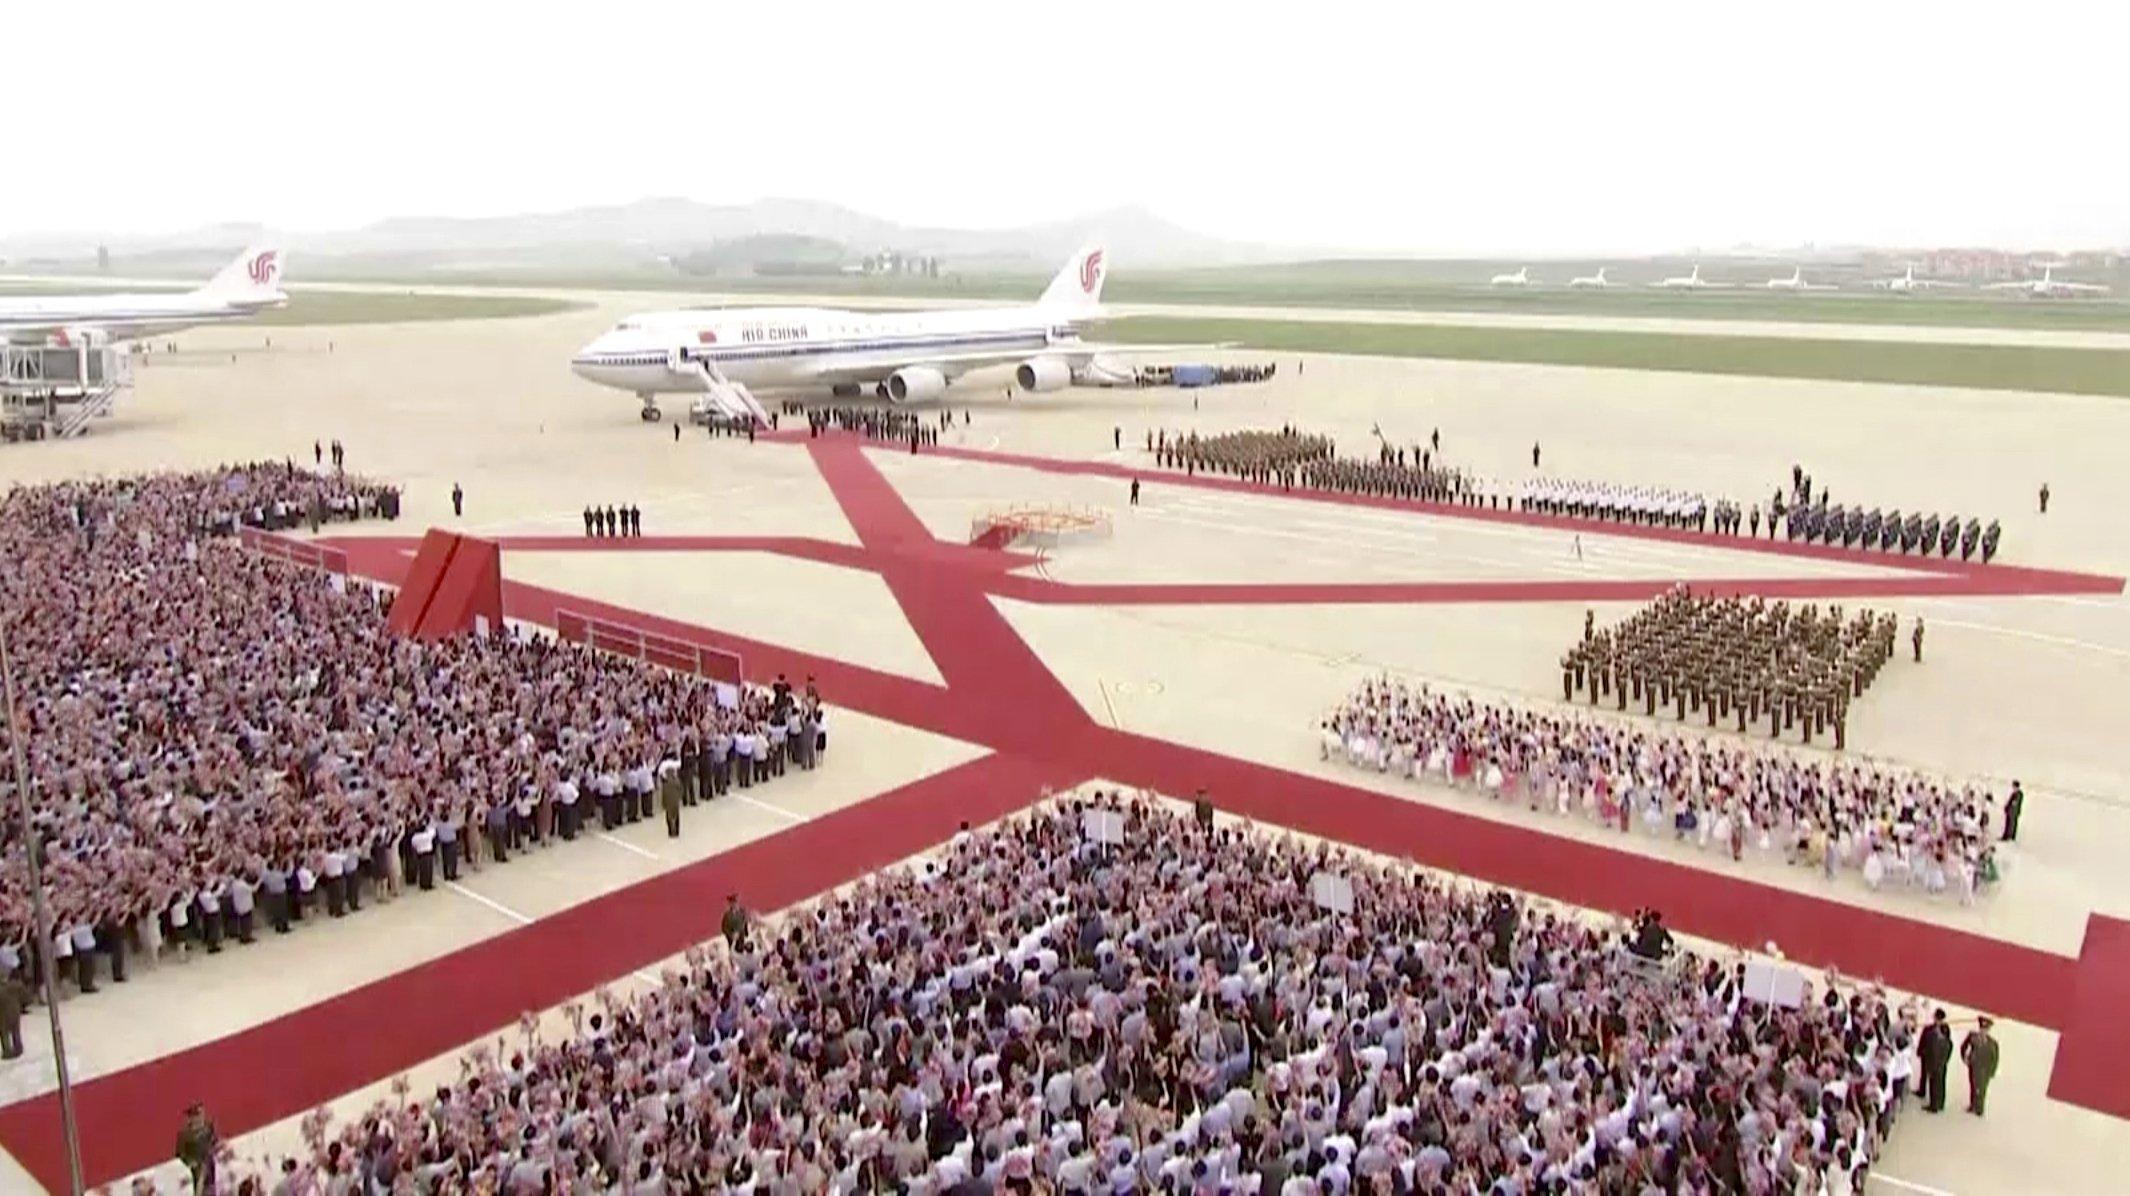 China's Xi Jinping holds talks with Kim Jong Un in N. Korea